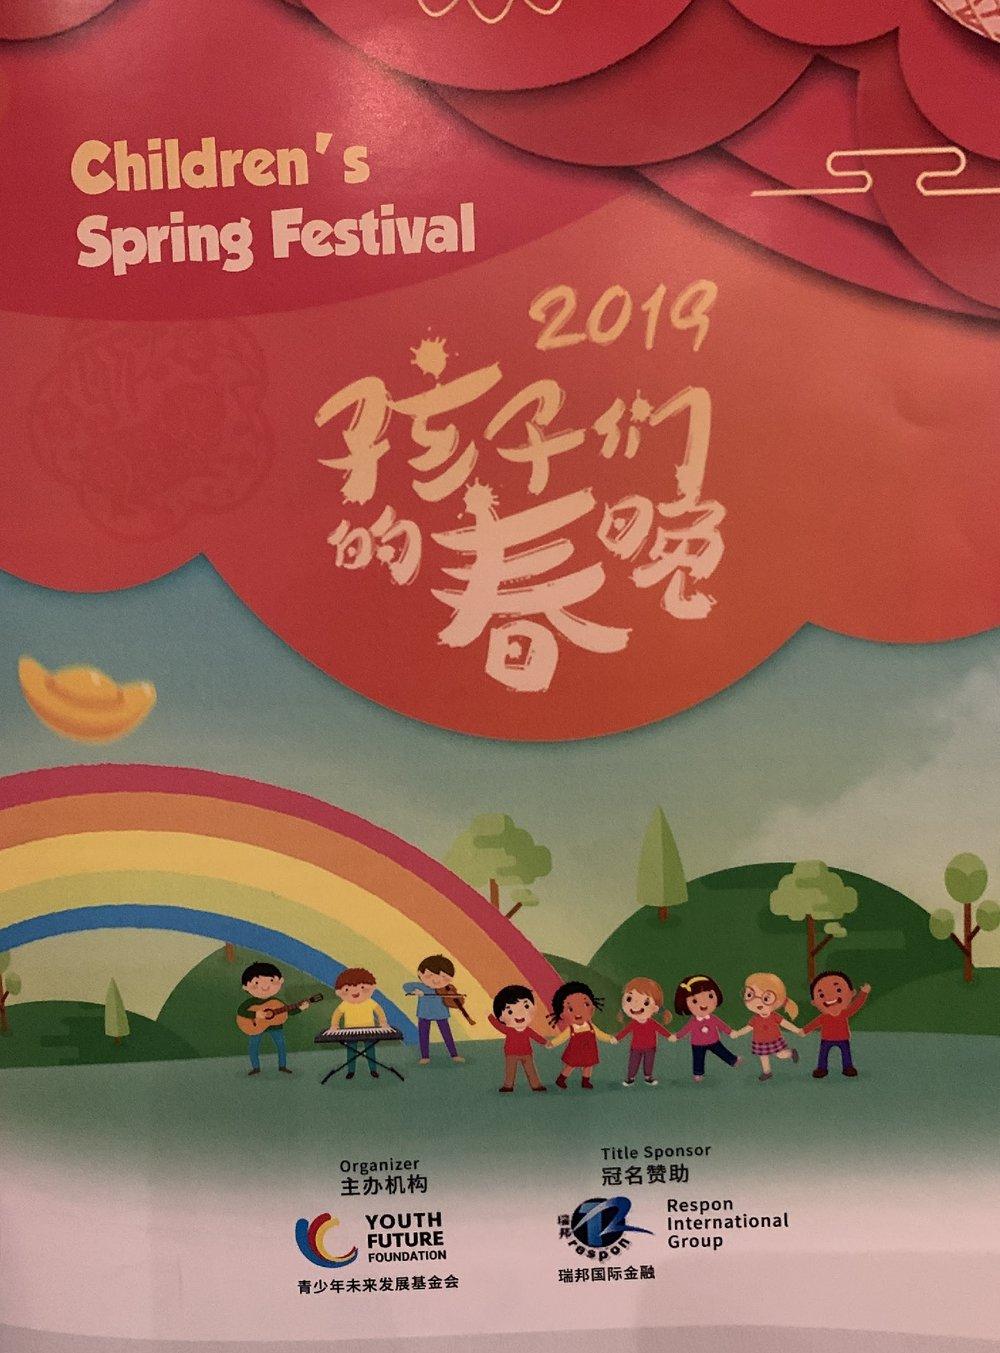 wayland-li-wushu-children-spring-fesitval-toronto-canada-2019-26.jpg